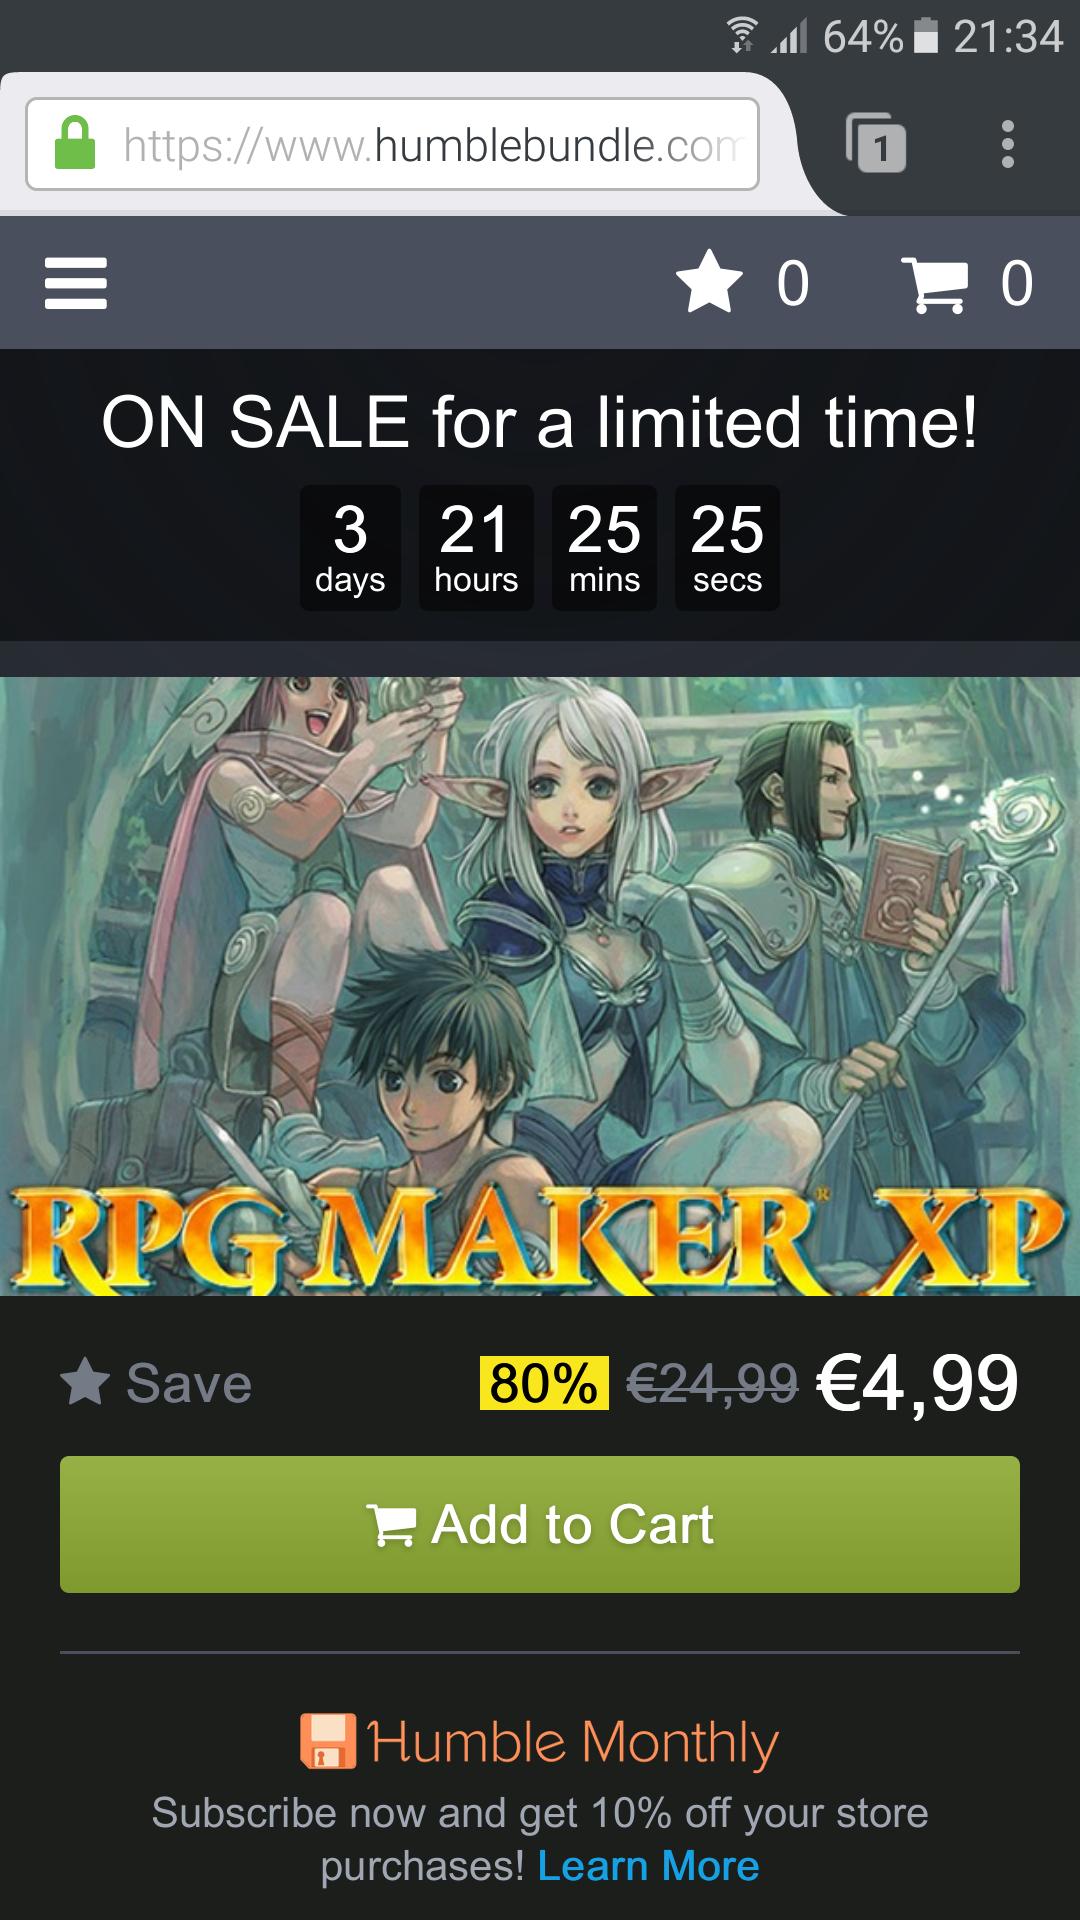 [Humble Bundle] RPG Maker XP stark reduziert